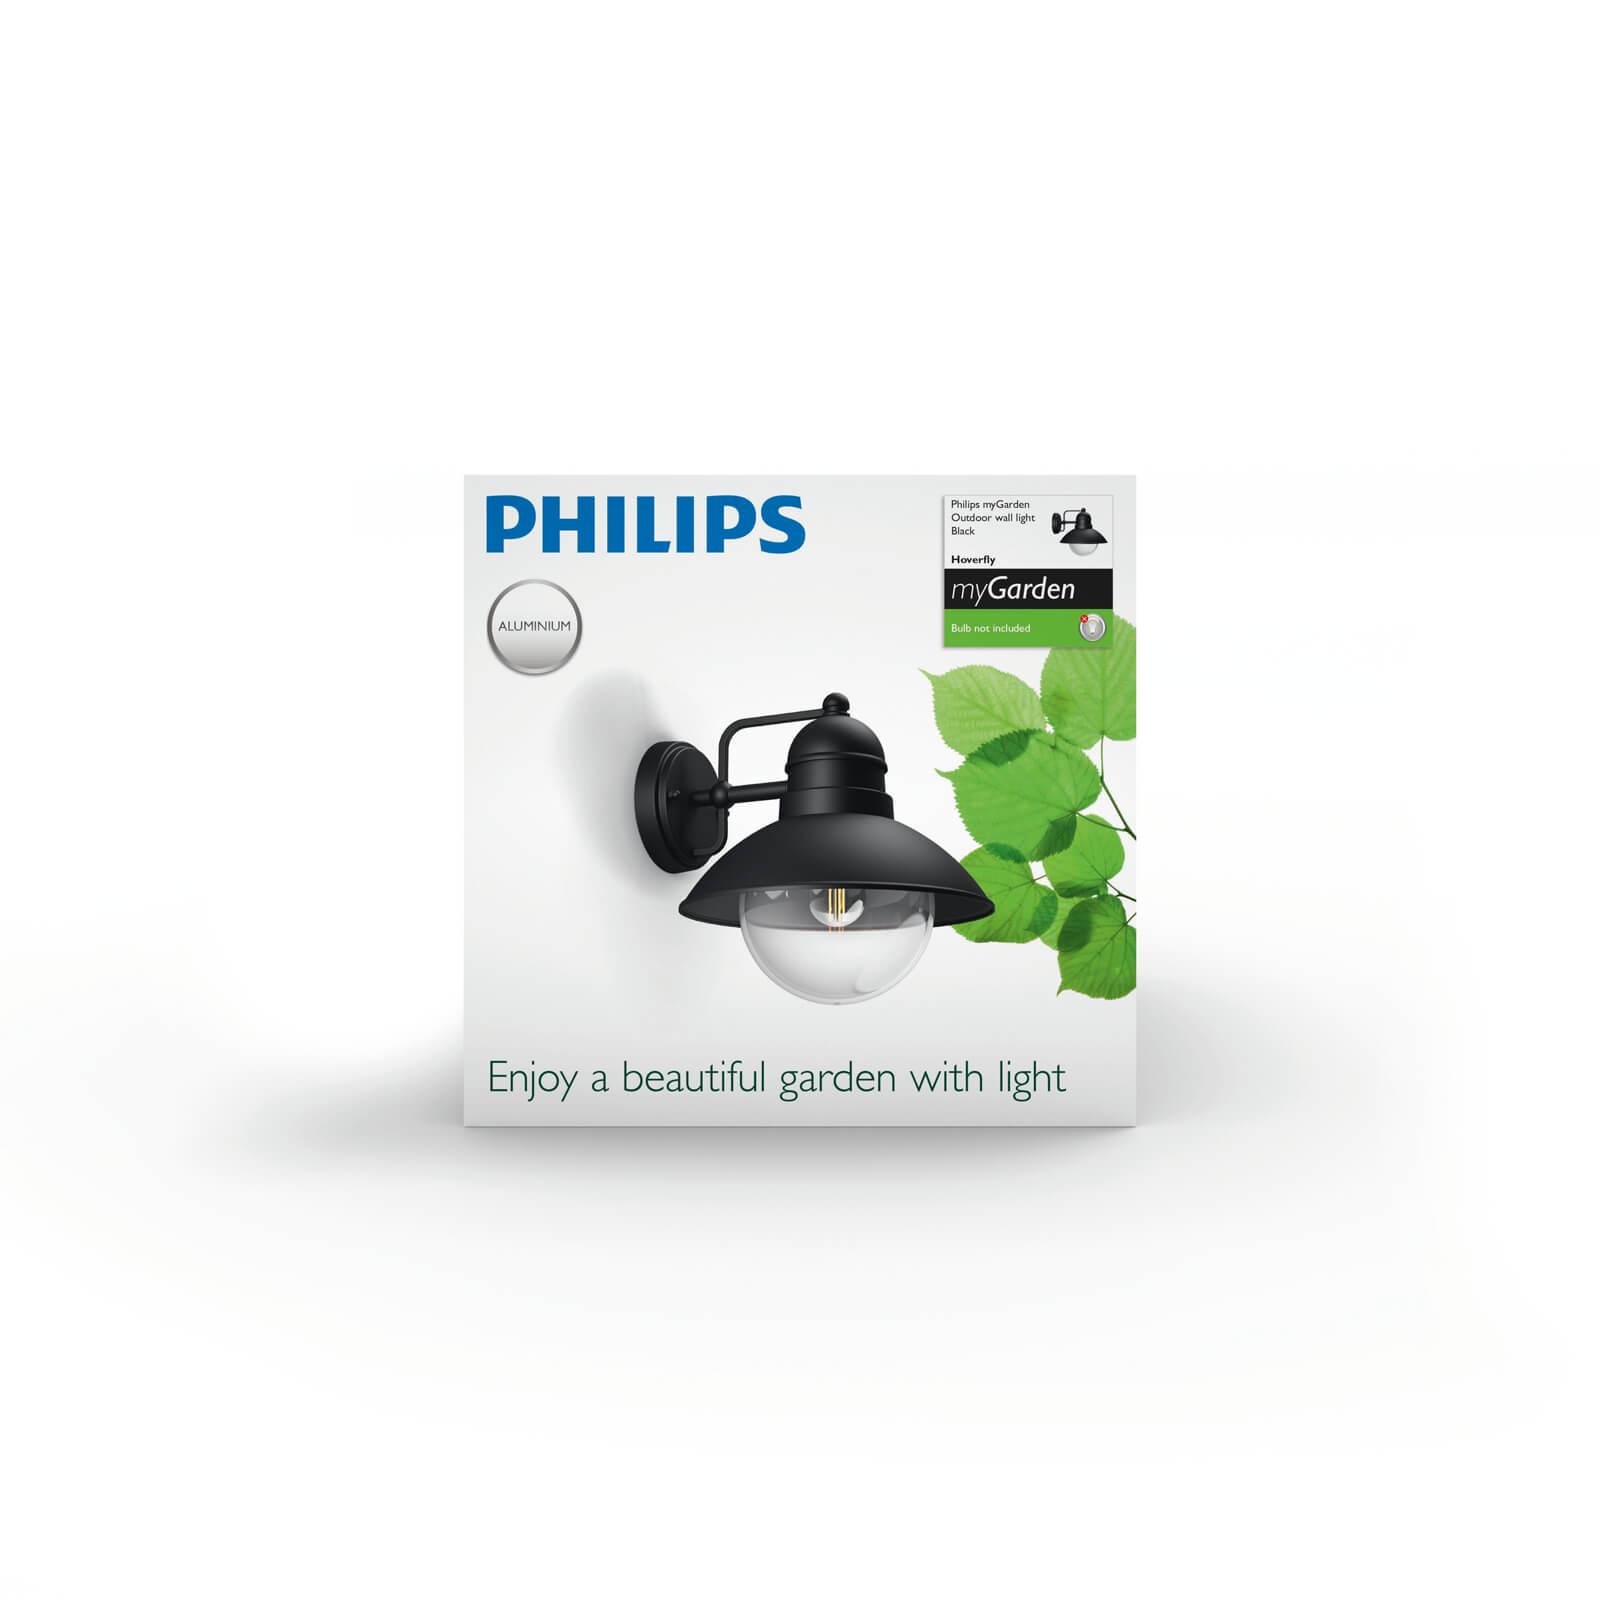 philips mygarden hoverfly wandlamp zwart. Black Bedroom Furniture Sets. Home Design Ideas